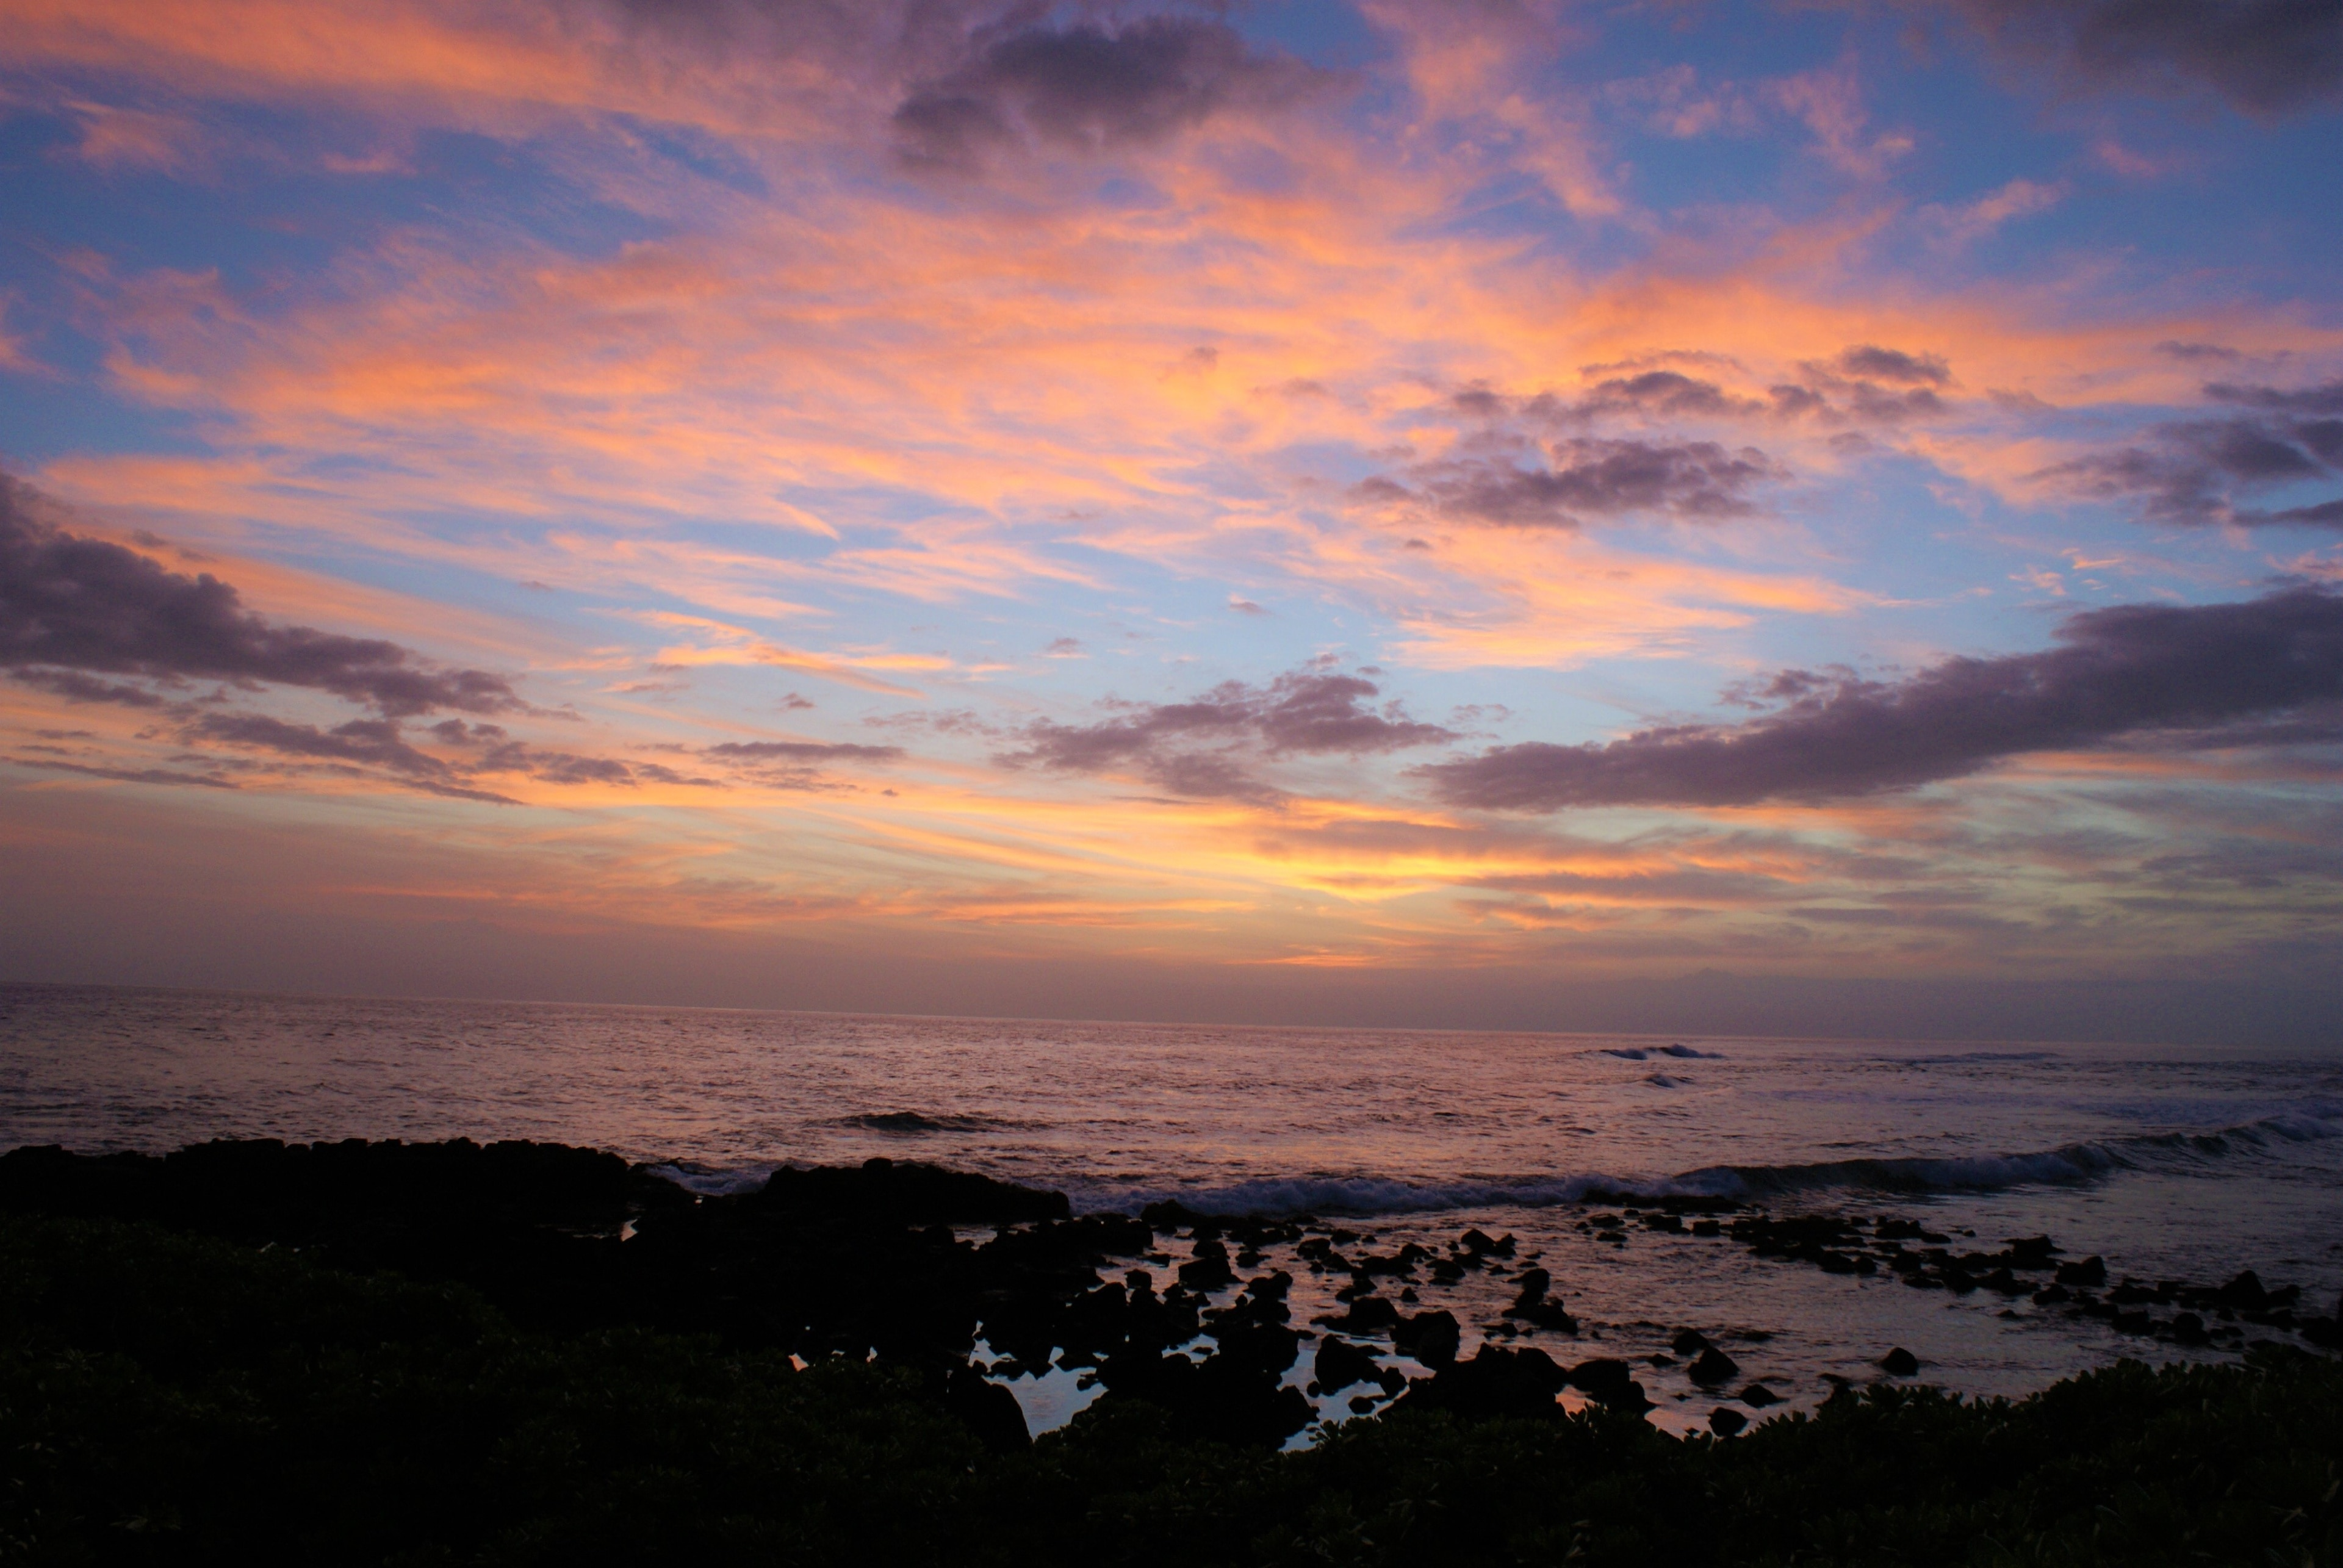 Kiahuna Beach, Koloa, Hawaii, United States of America